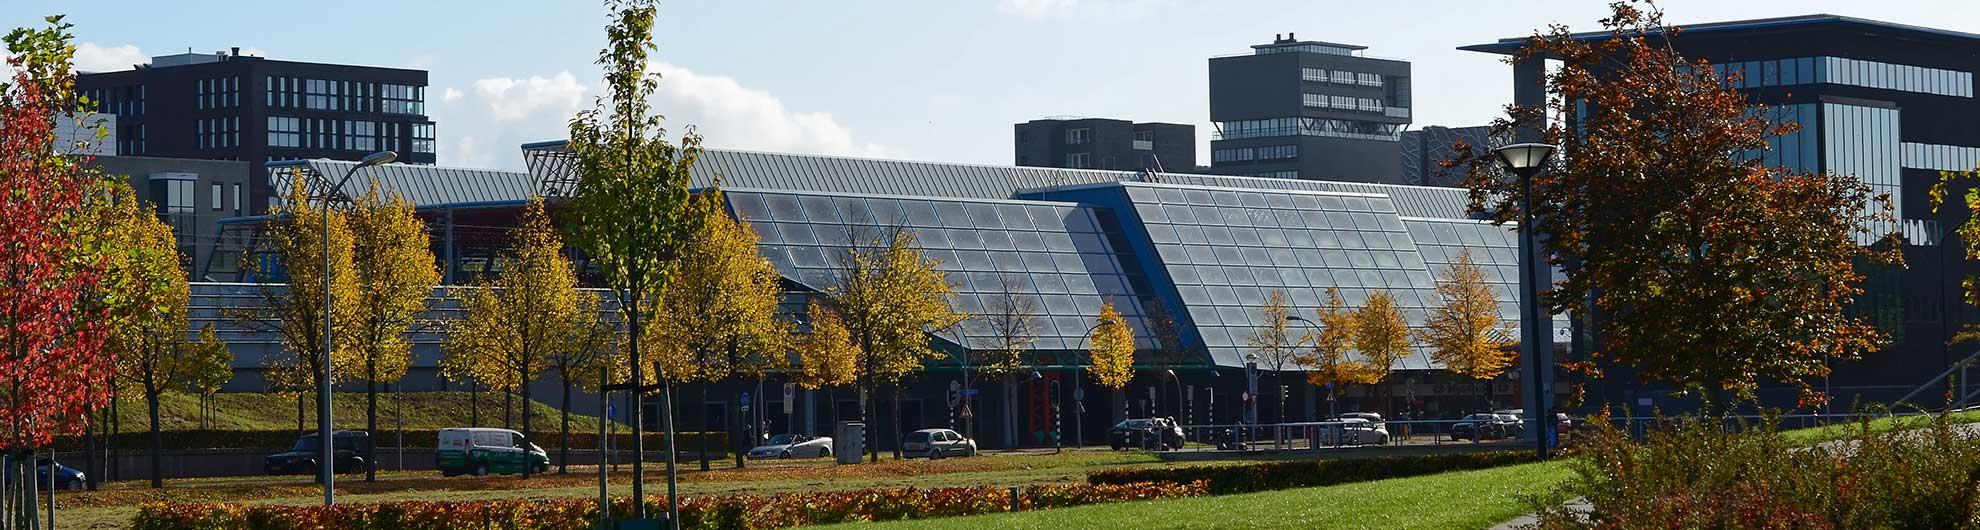 Station Lelystad